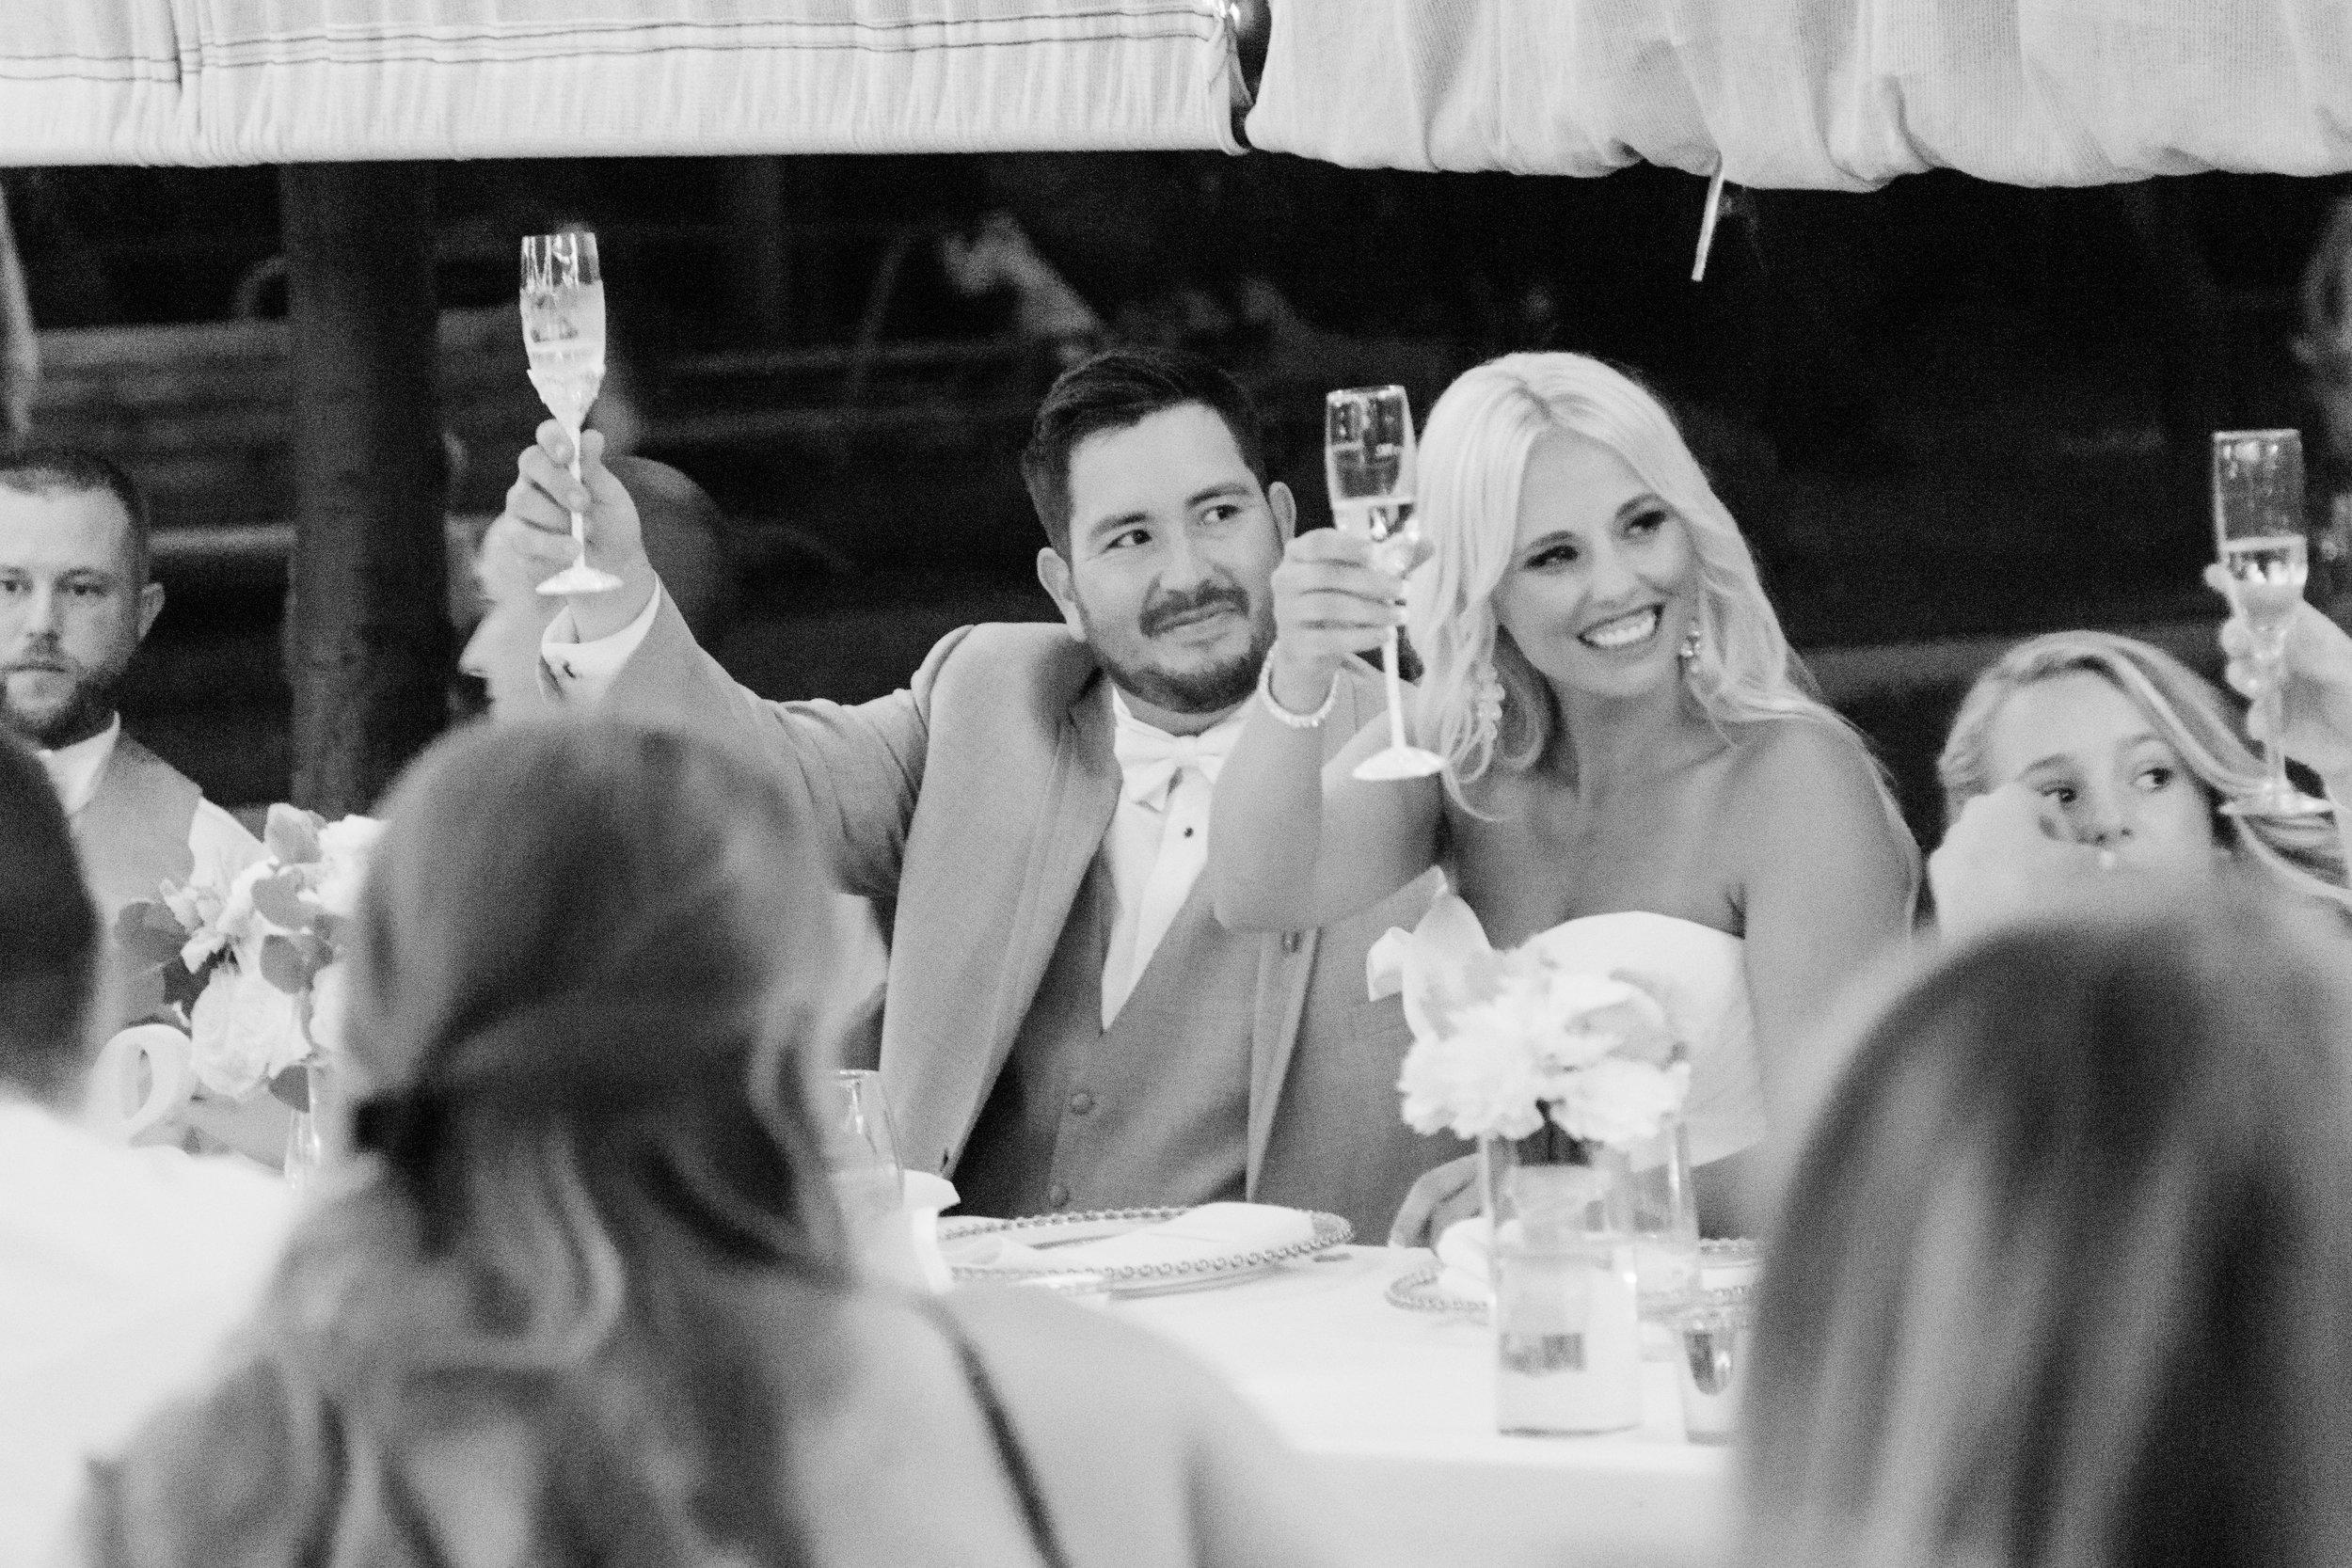 White Ranch Events - Chico - Ashley Teasley Photography - Sacramento Wedding Photographer 38.JPG